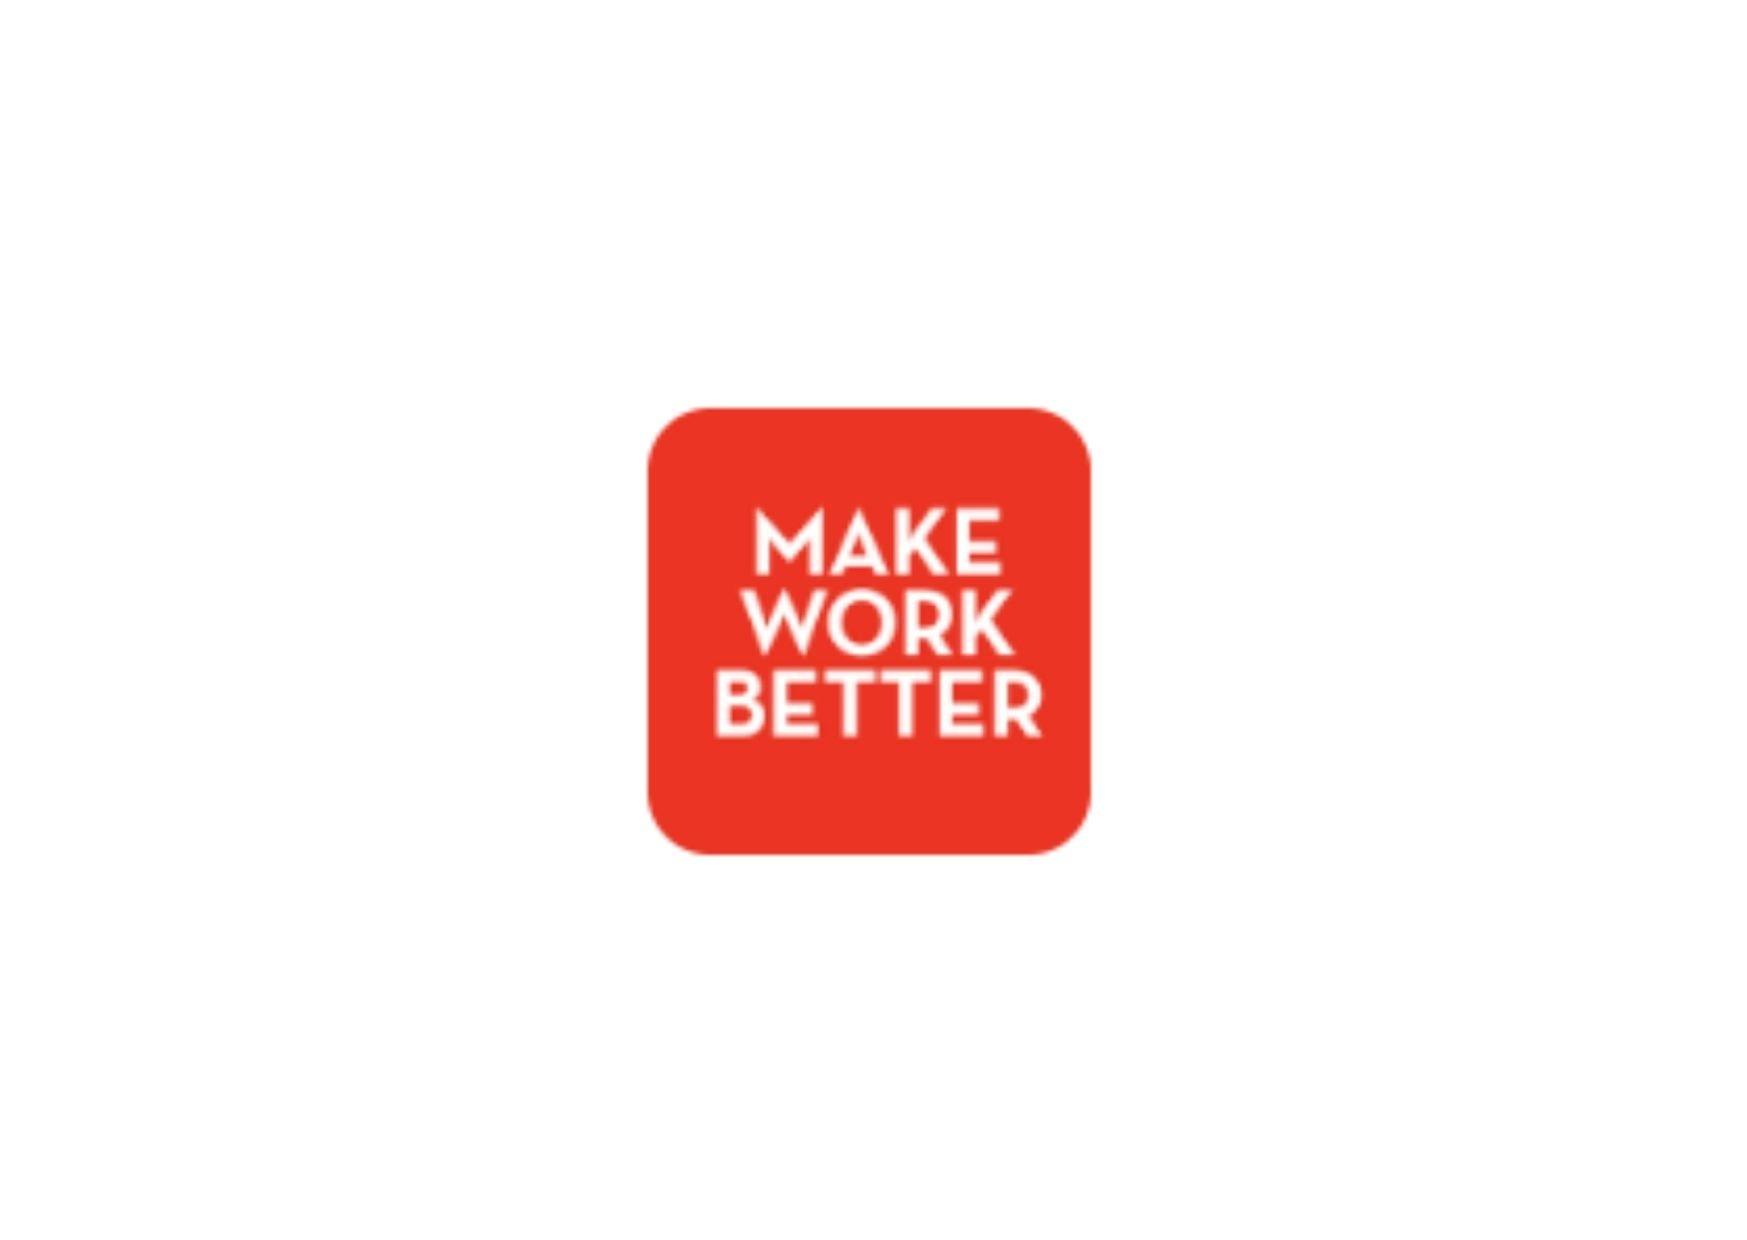 Make Work Better newsletter highlights The Lonely Century